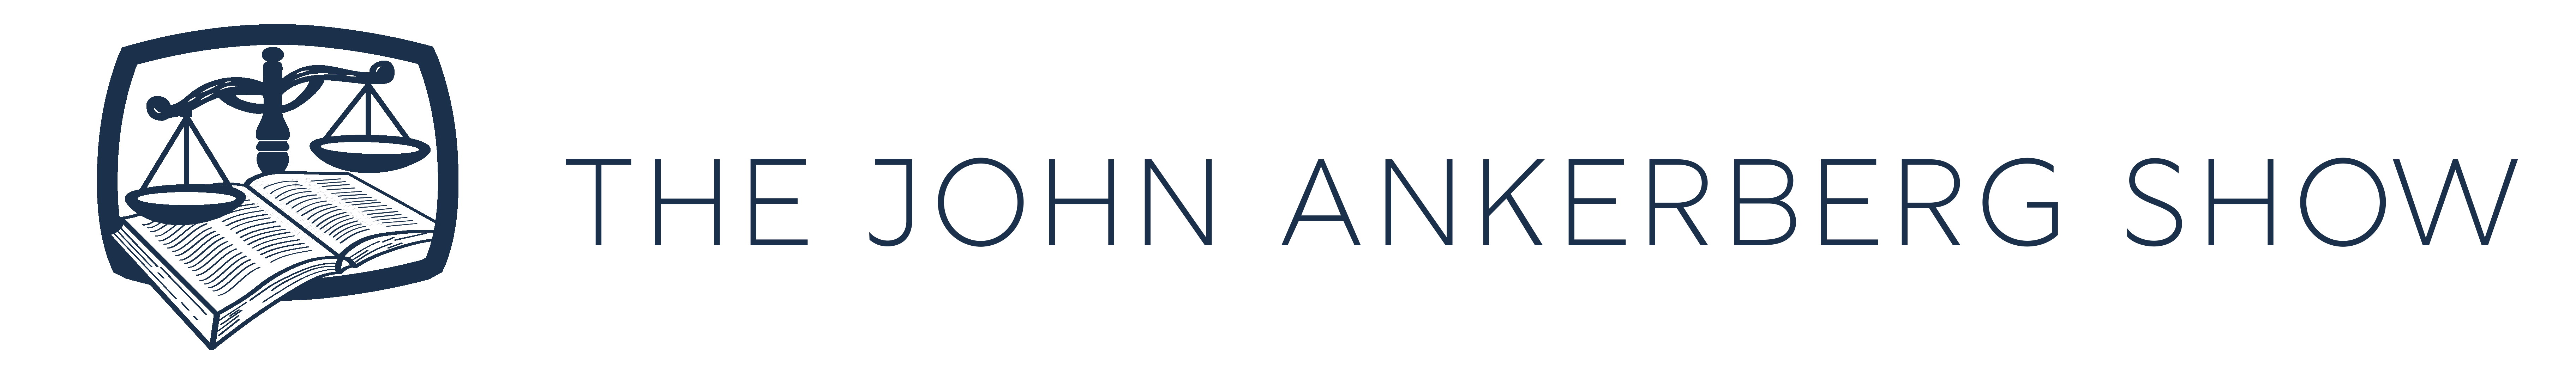 546A7B The John Ankerberg Long Transparent